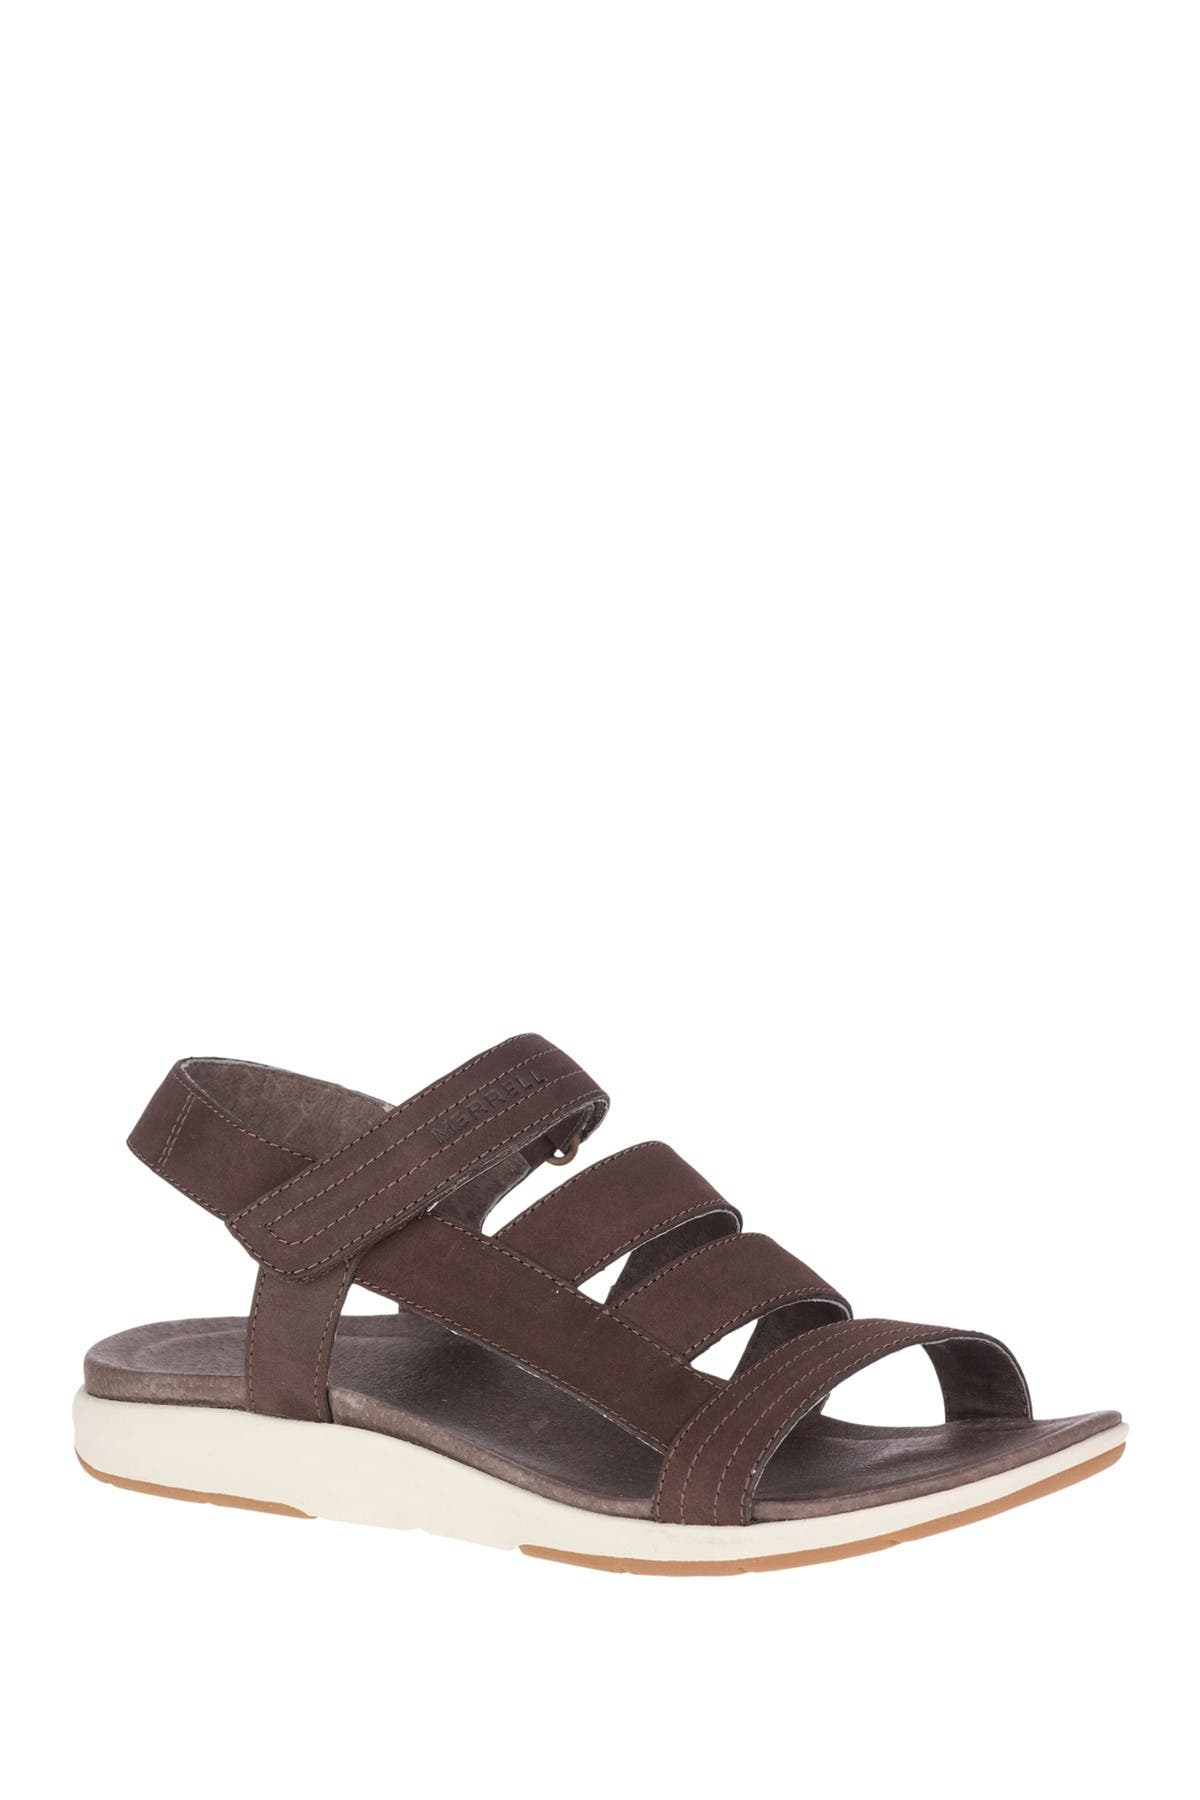 Image of Merrell Kalari Lore Strappy Leather Sandal